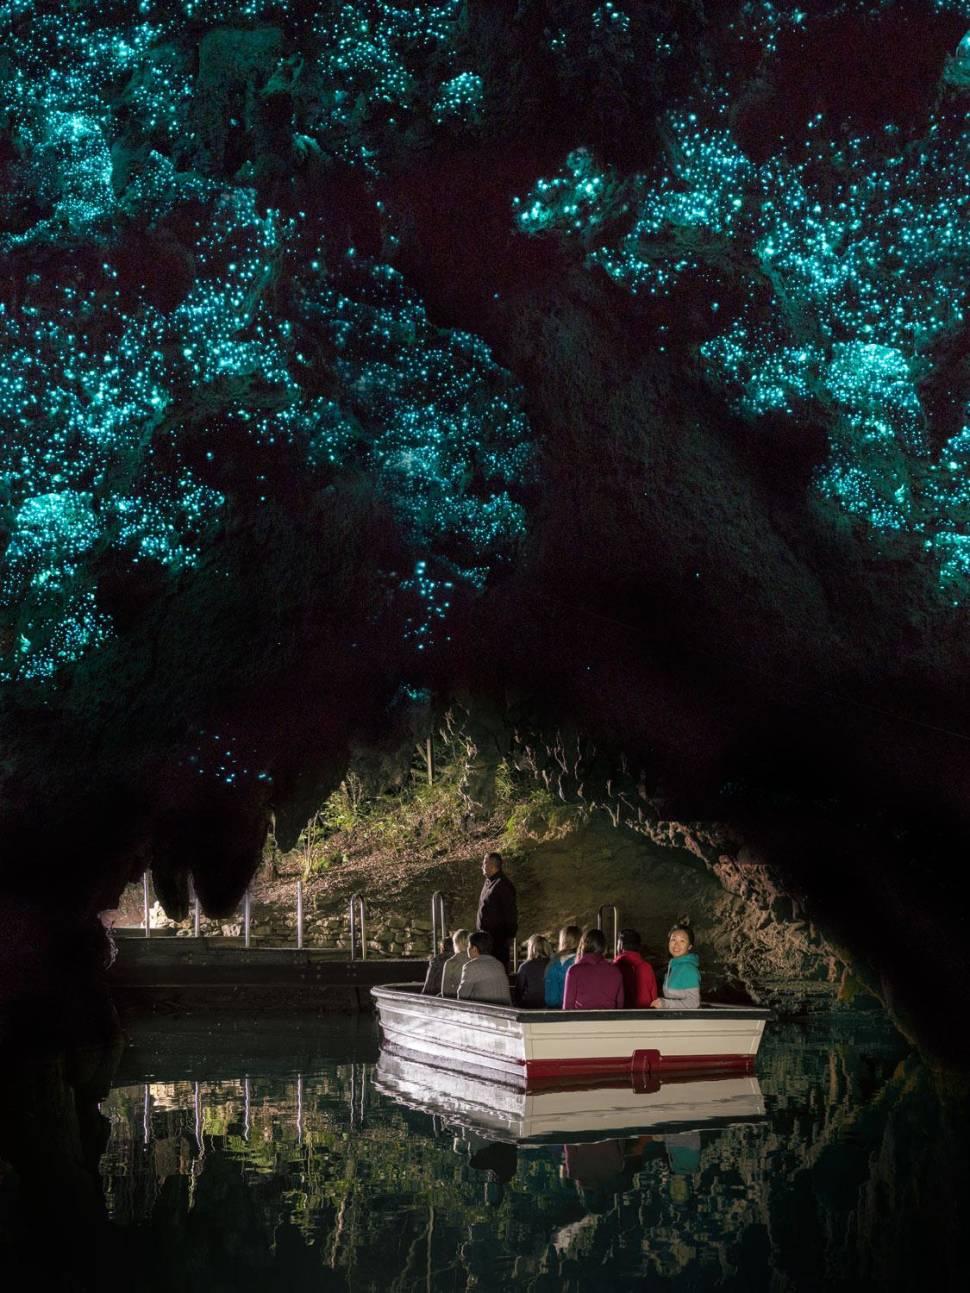 Waitomo Glowworm Caves in New Zealand - Best Season